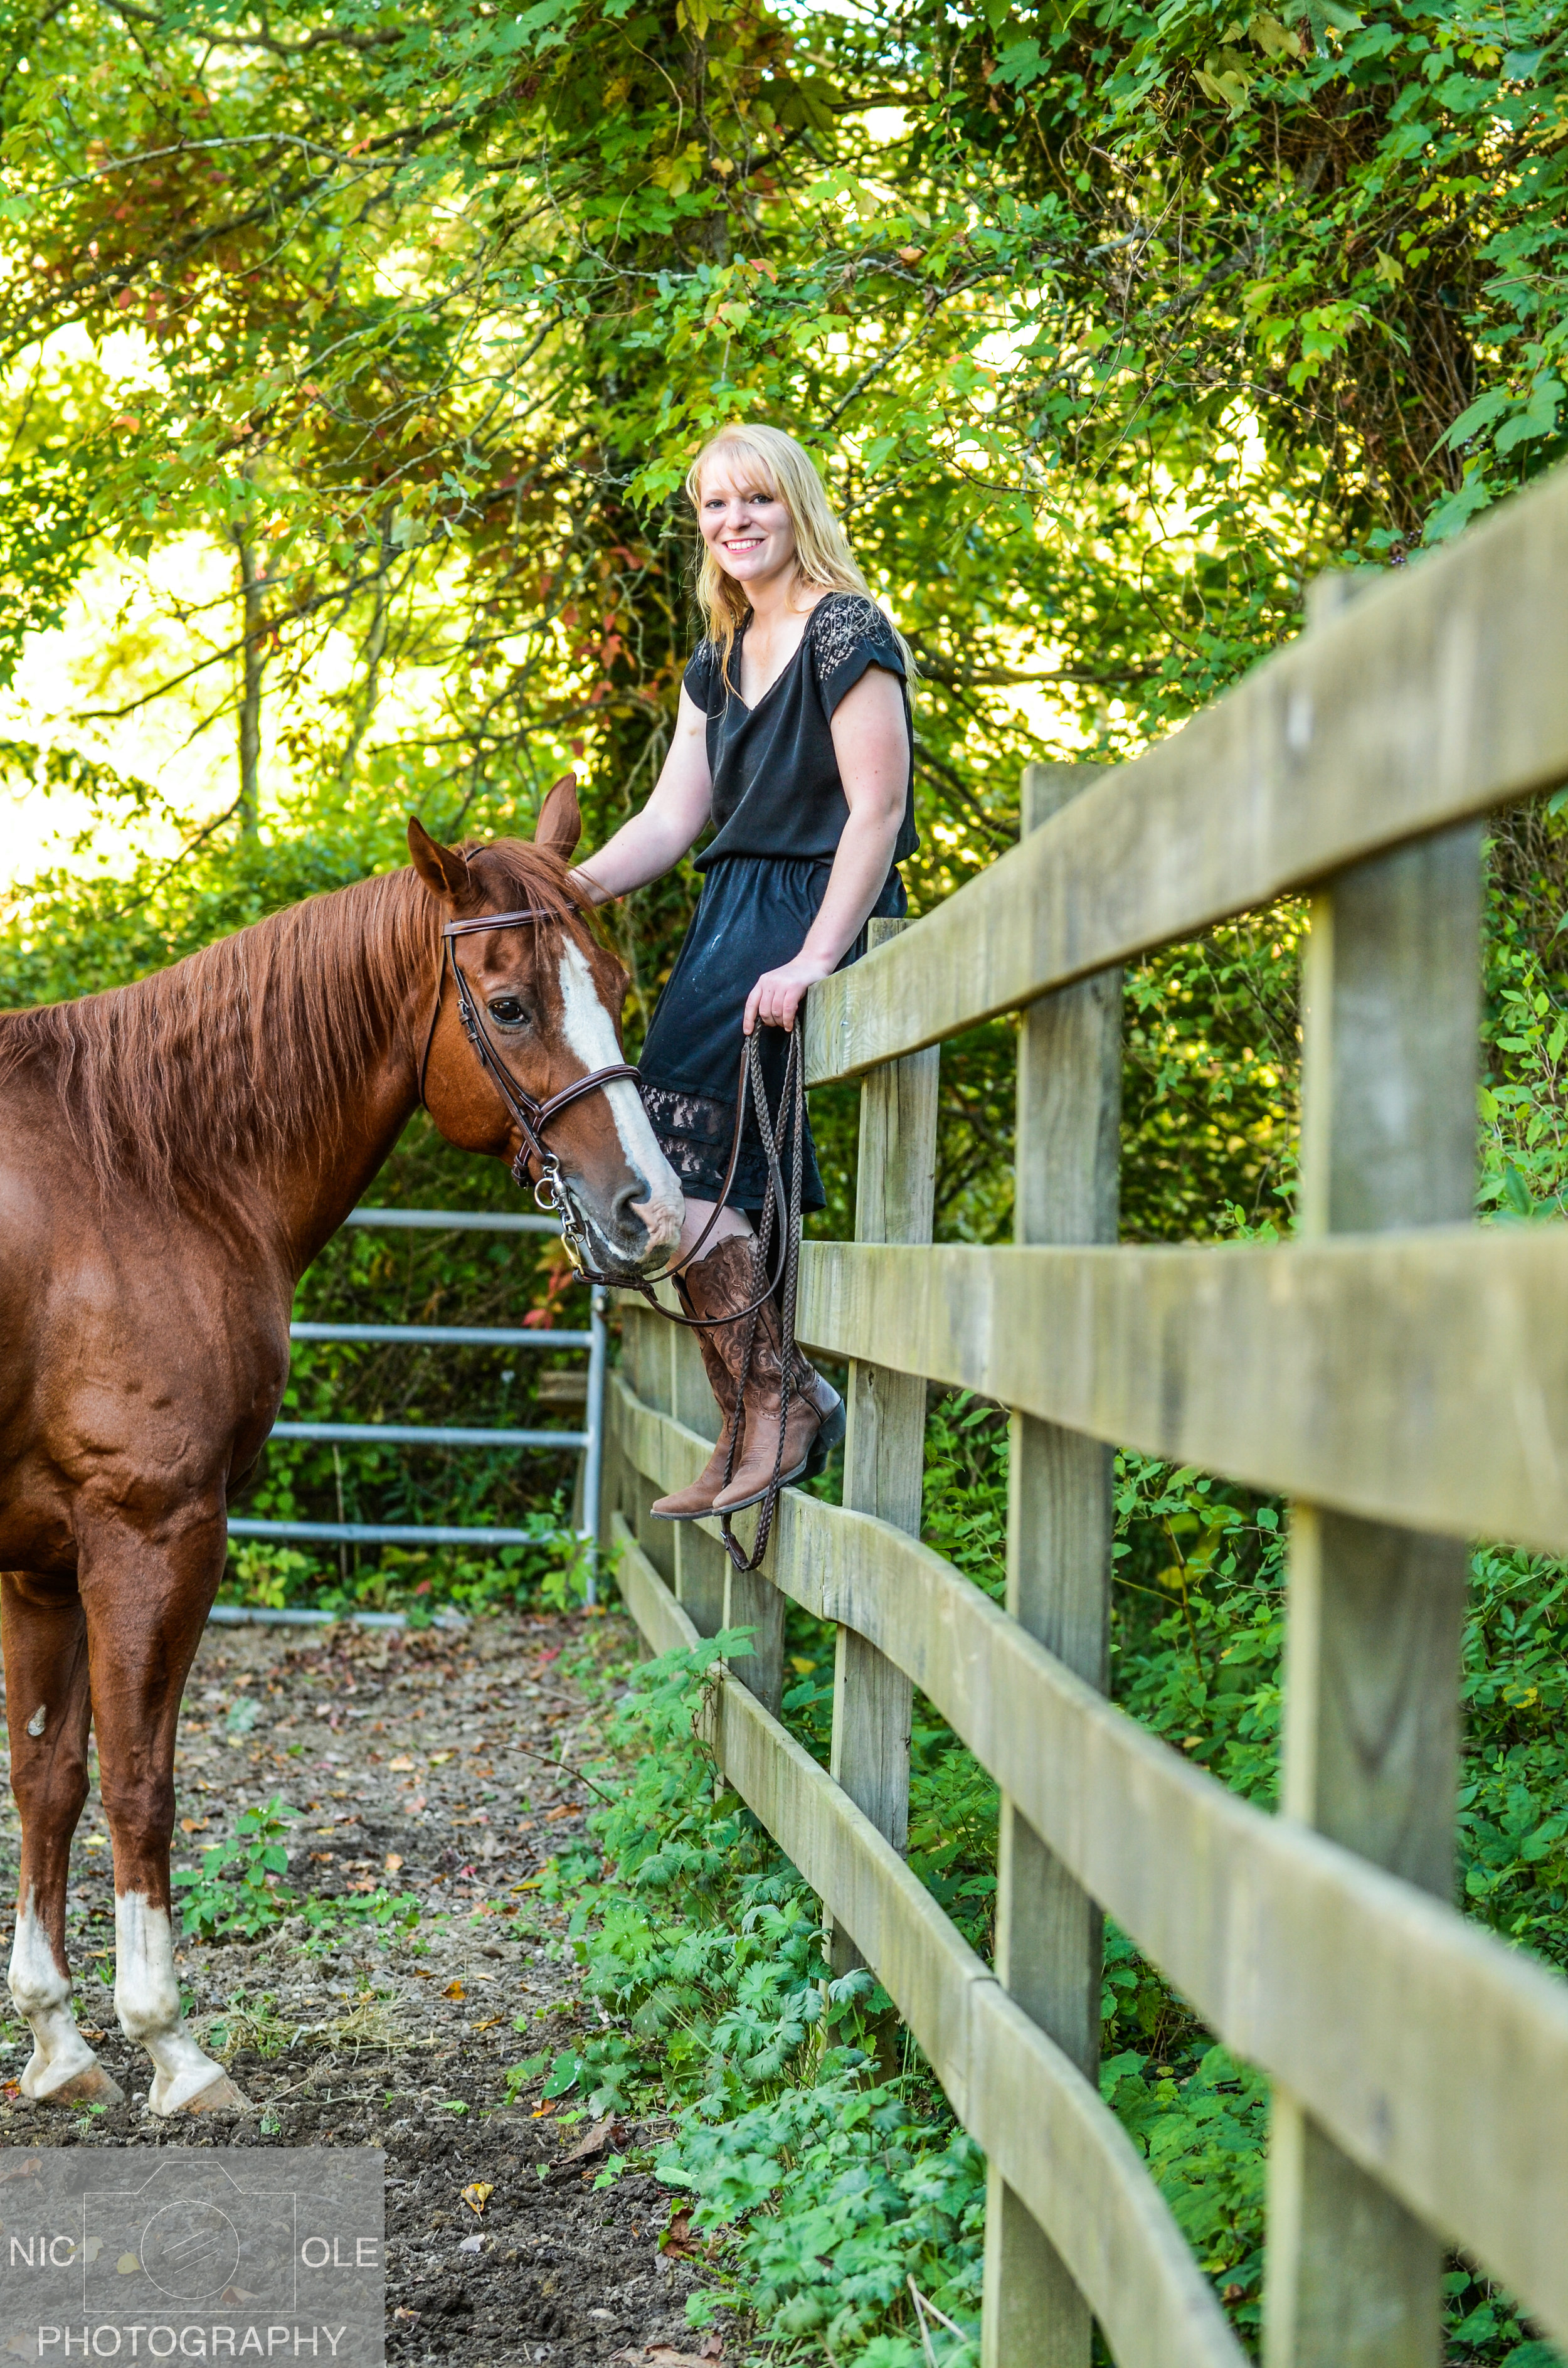 Erica & Albert 10.4.17-NIC.OLE Photography -17.jpg